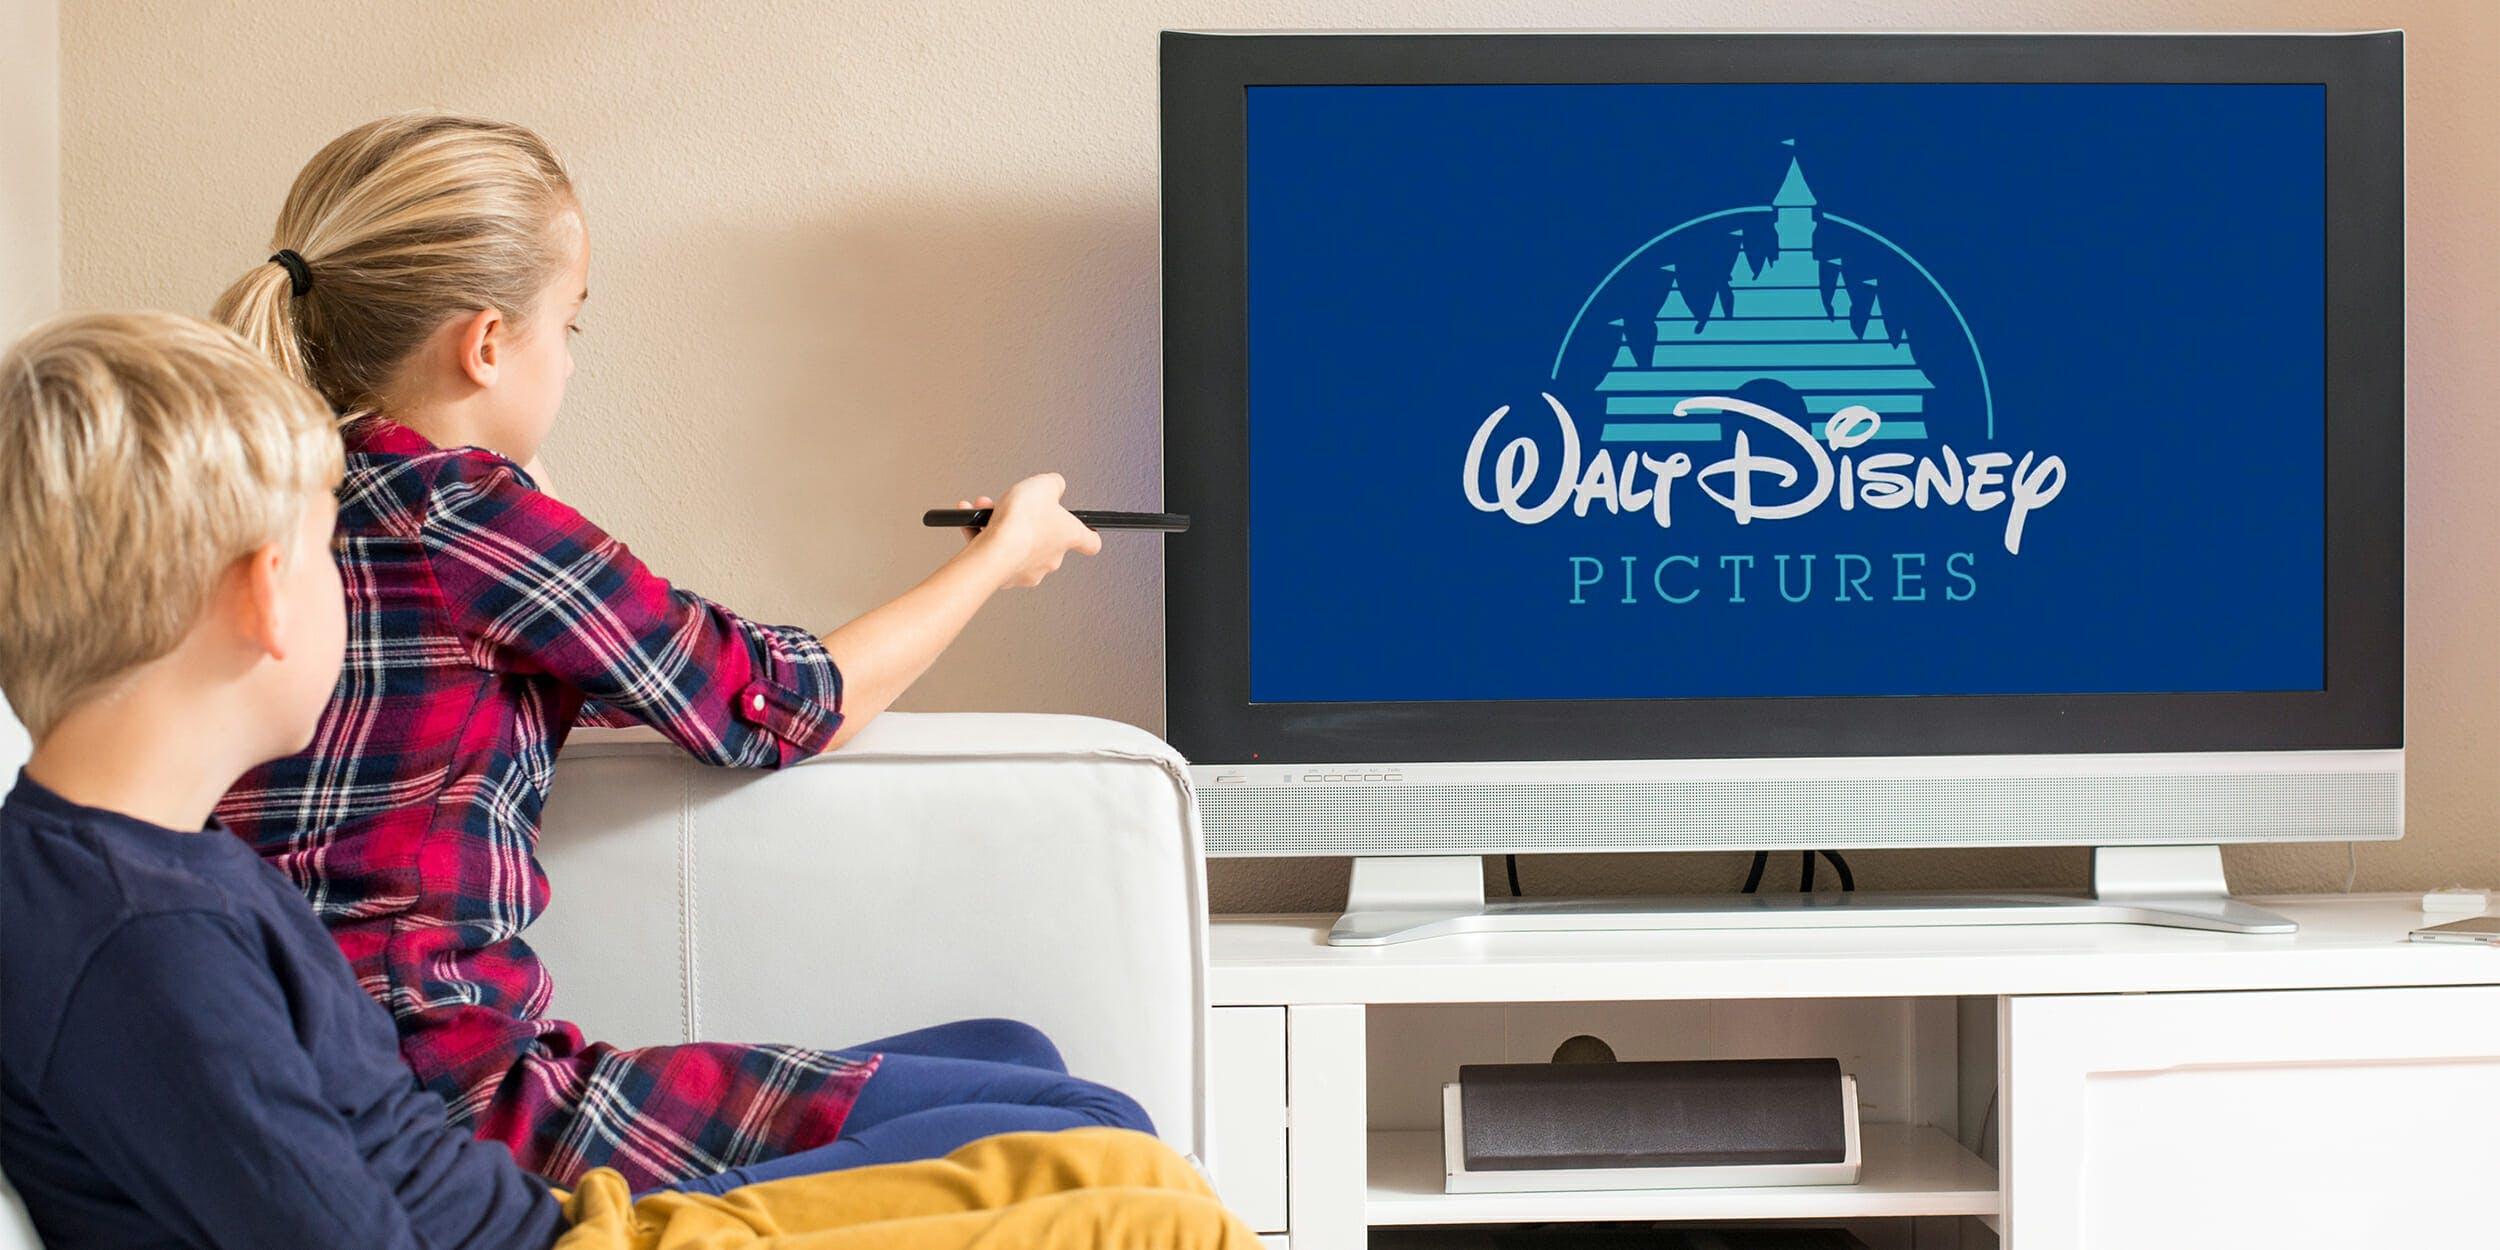 disney streaming service kids watching walt disney pictures